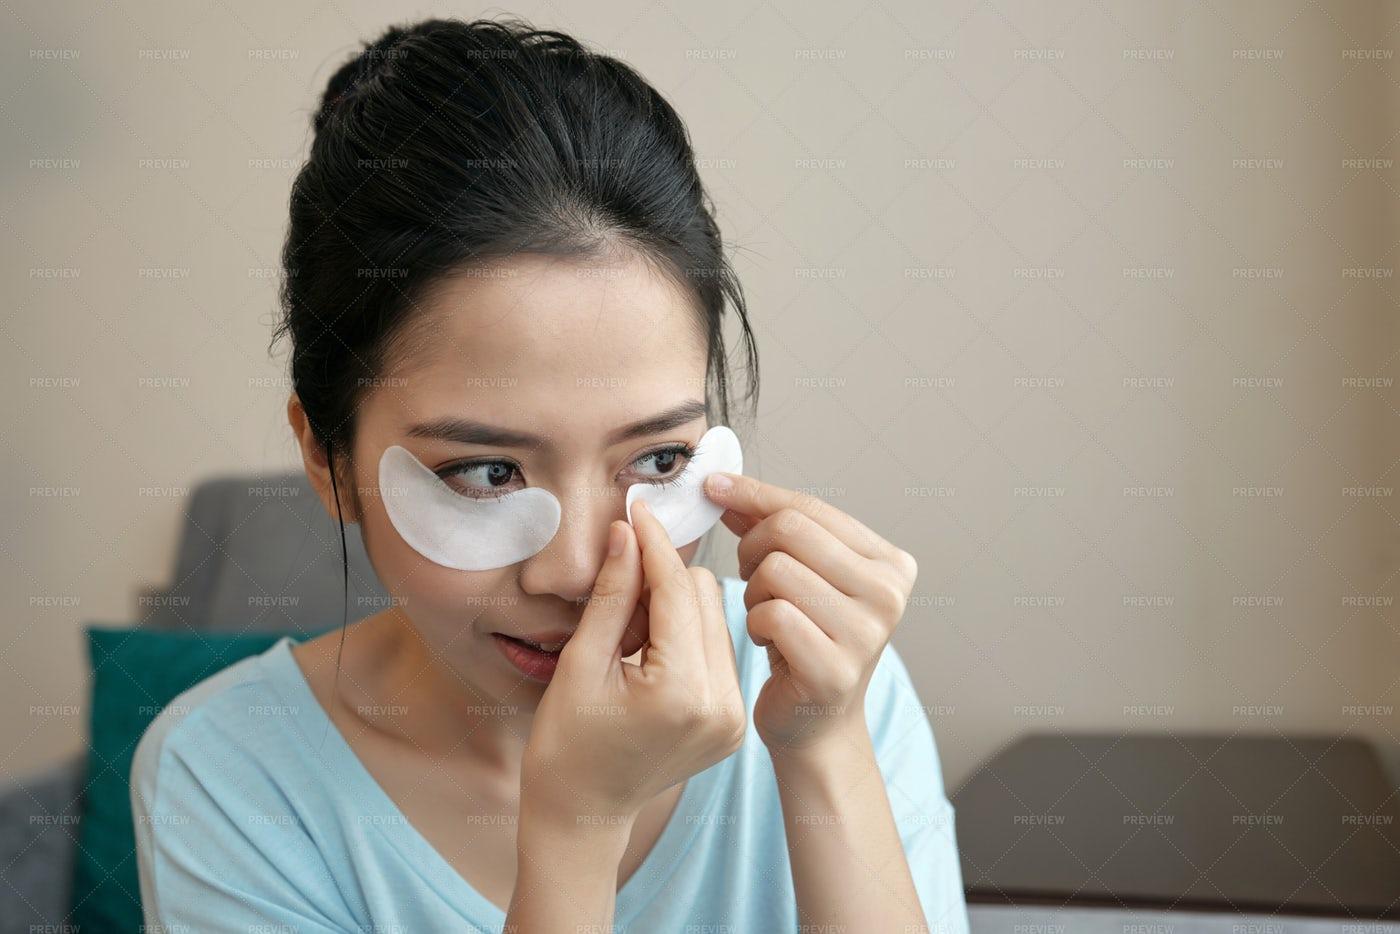 Asian Woman Applying Under-eye Pads: Stock Photos